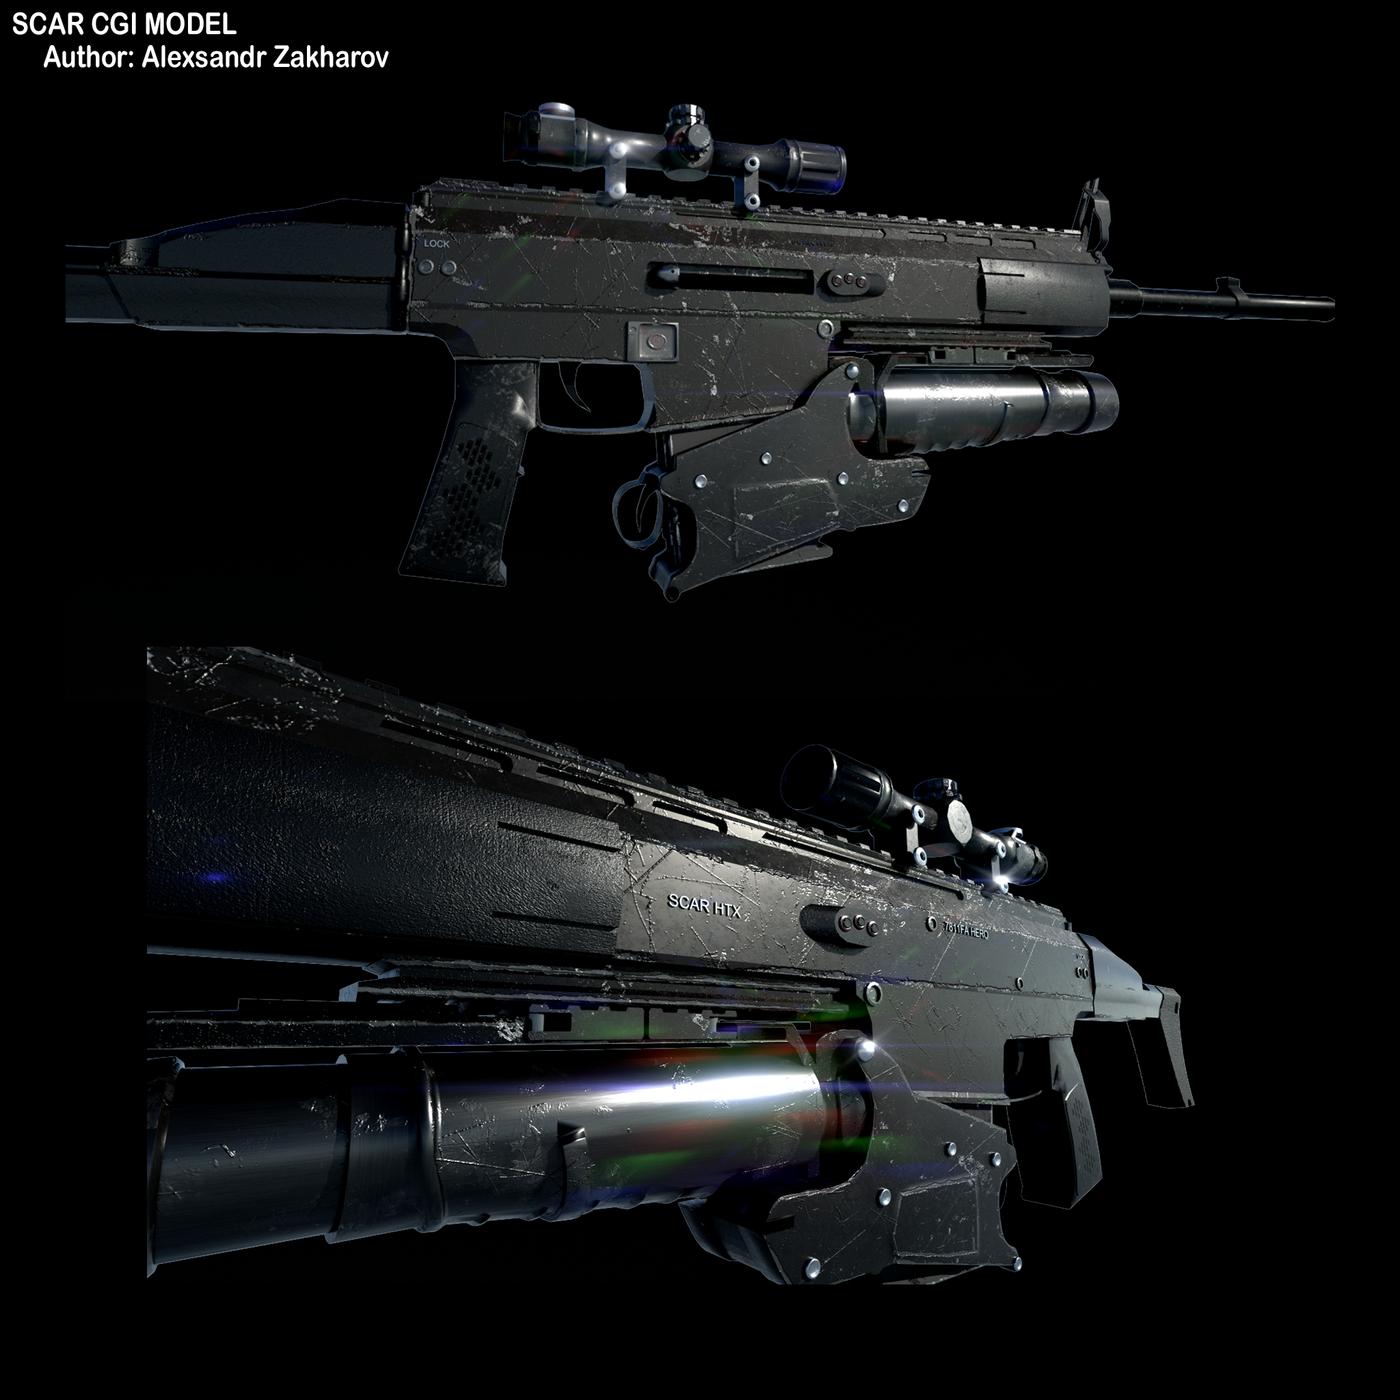 CGI 3D models by: Alexsandr Zakharov